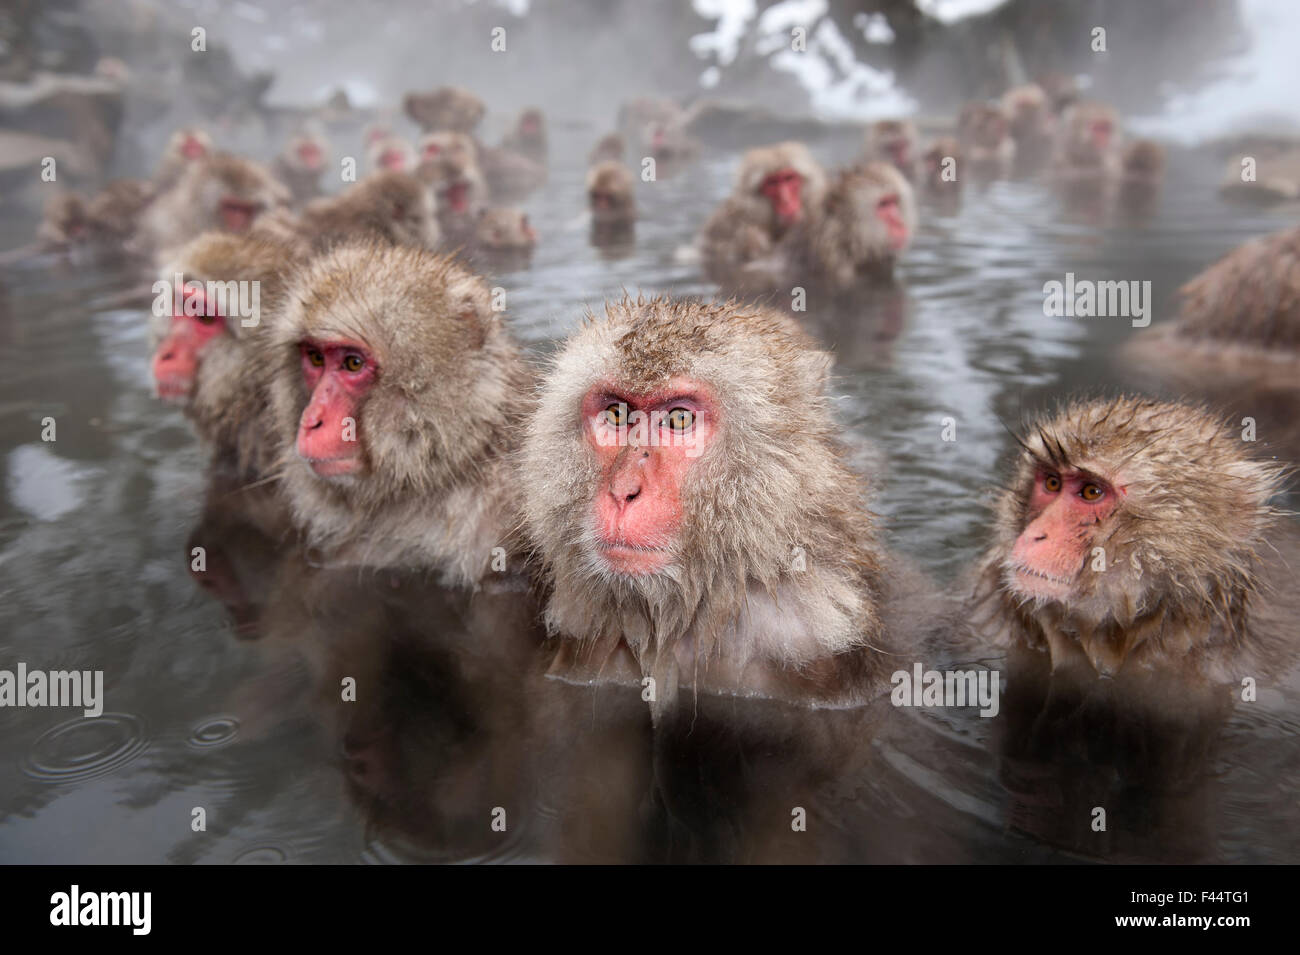 Japanese Macaques (Macaca fuscata) in hot springs, Jigokudani, Nagano Prefecture, Honshu, Japan - Stock Image